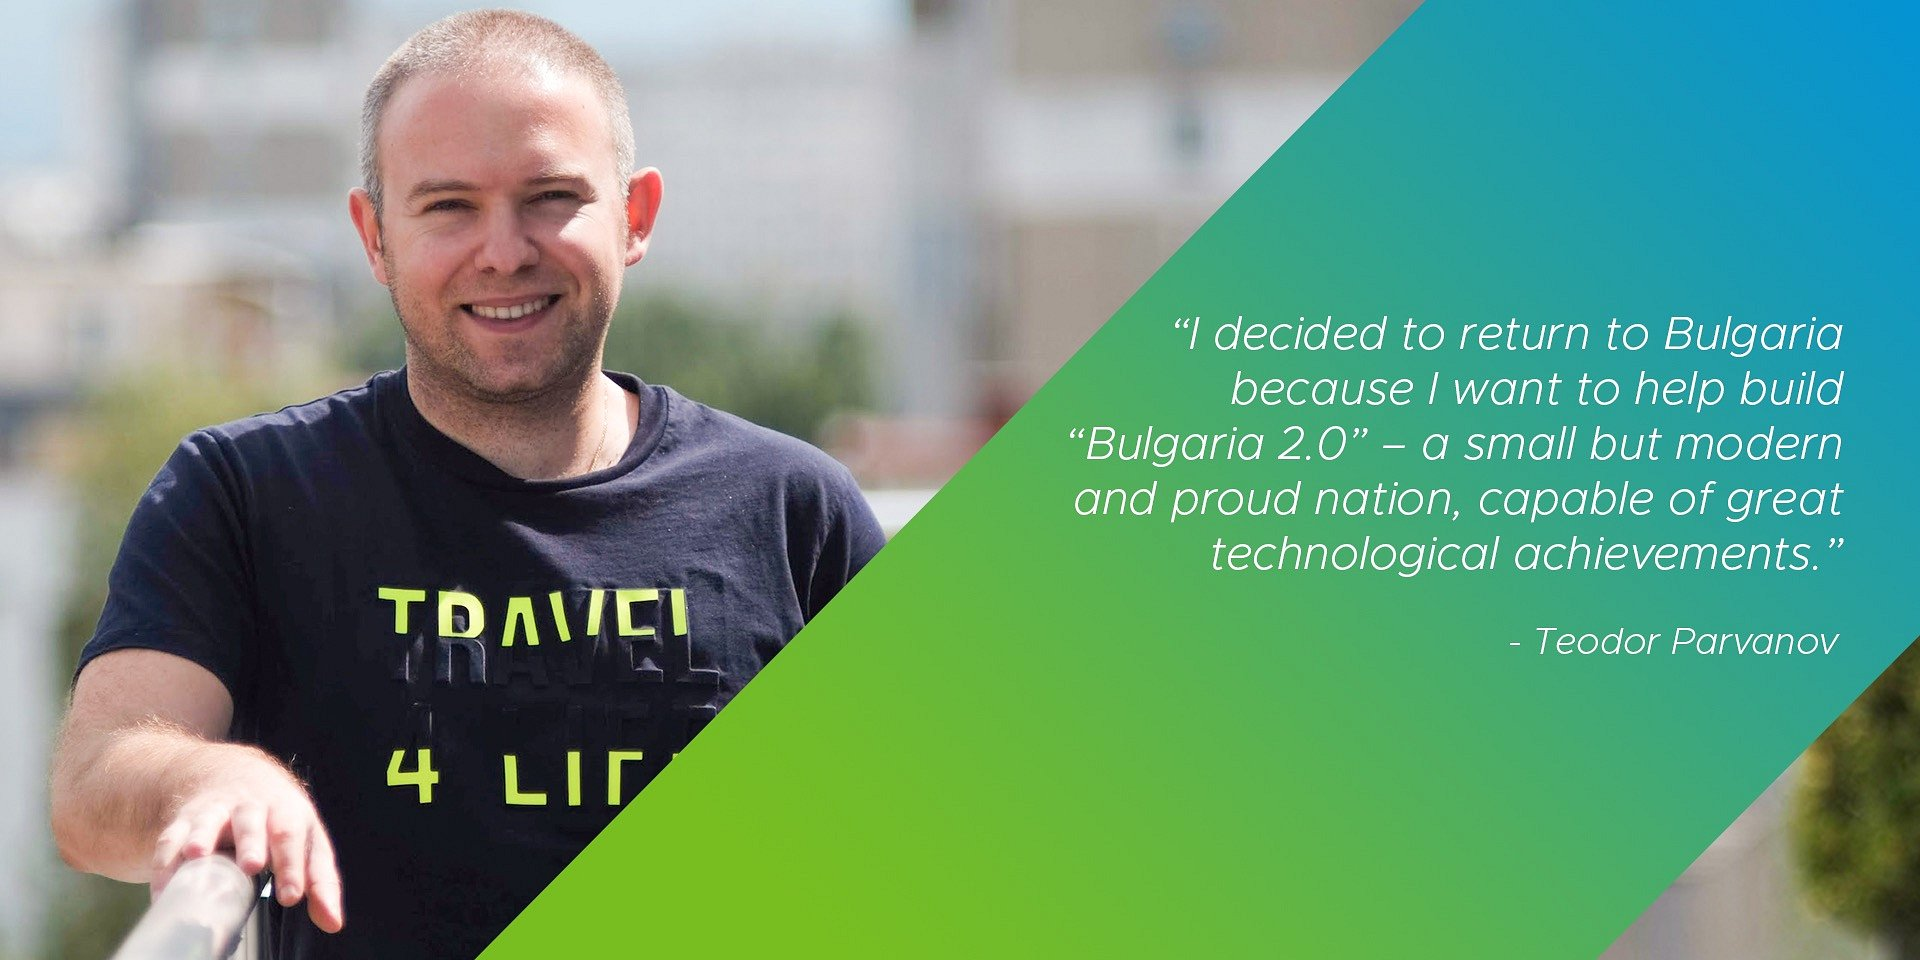 Meet the speakers: Teodor Parvanov, Senior Software Engineer, vSphere Analytics (and exploring Blockchain!)